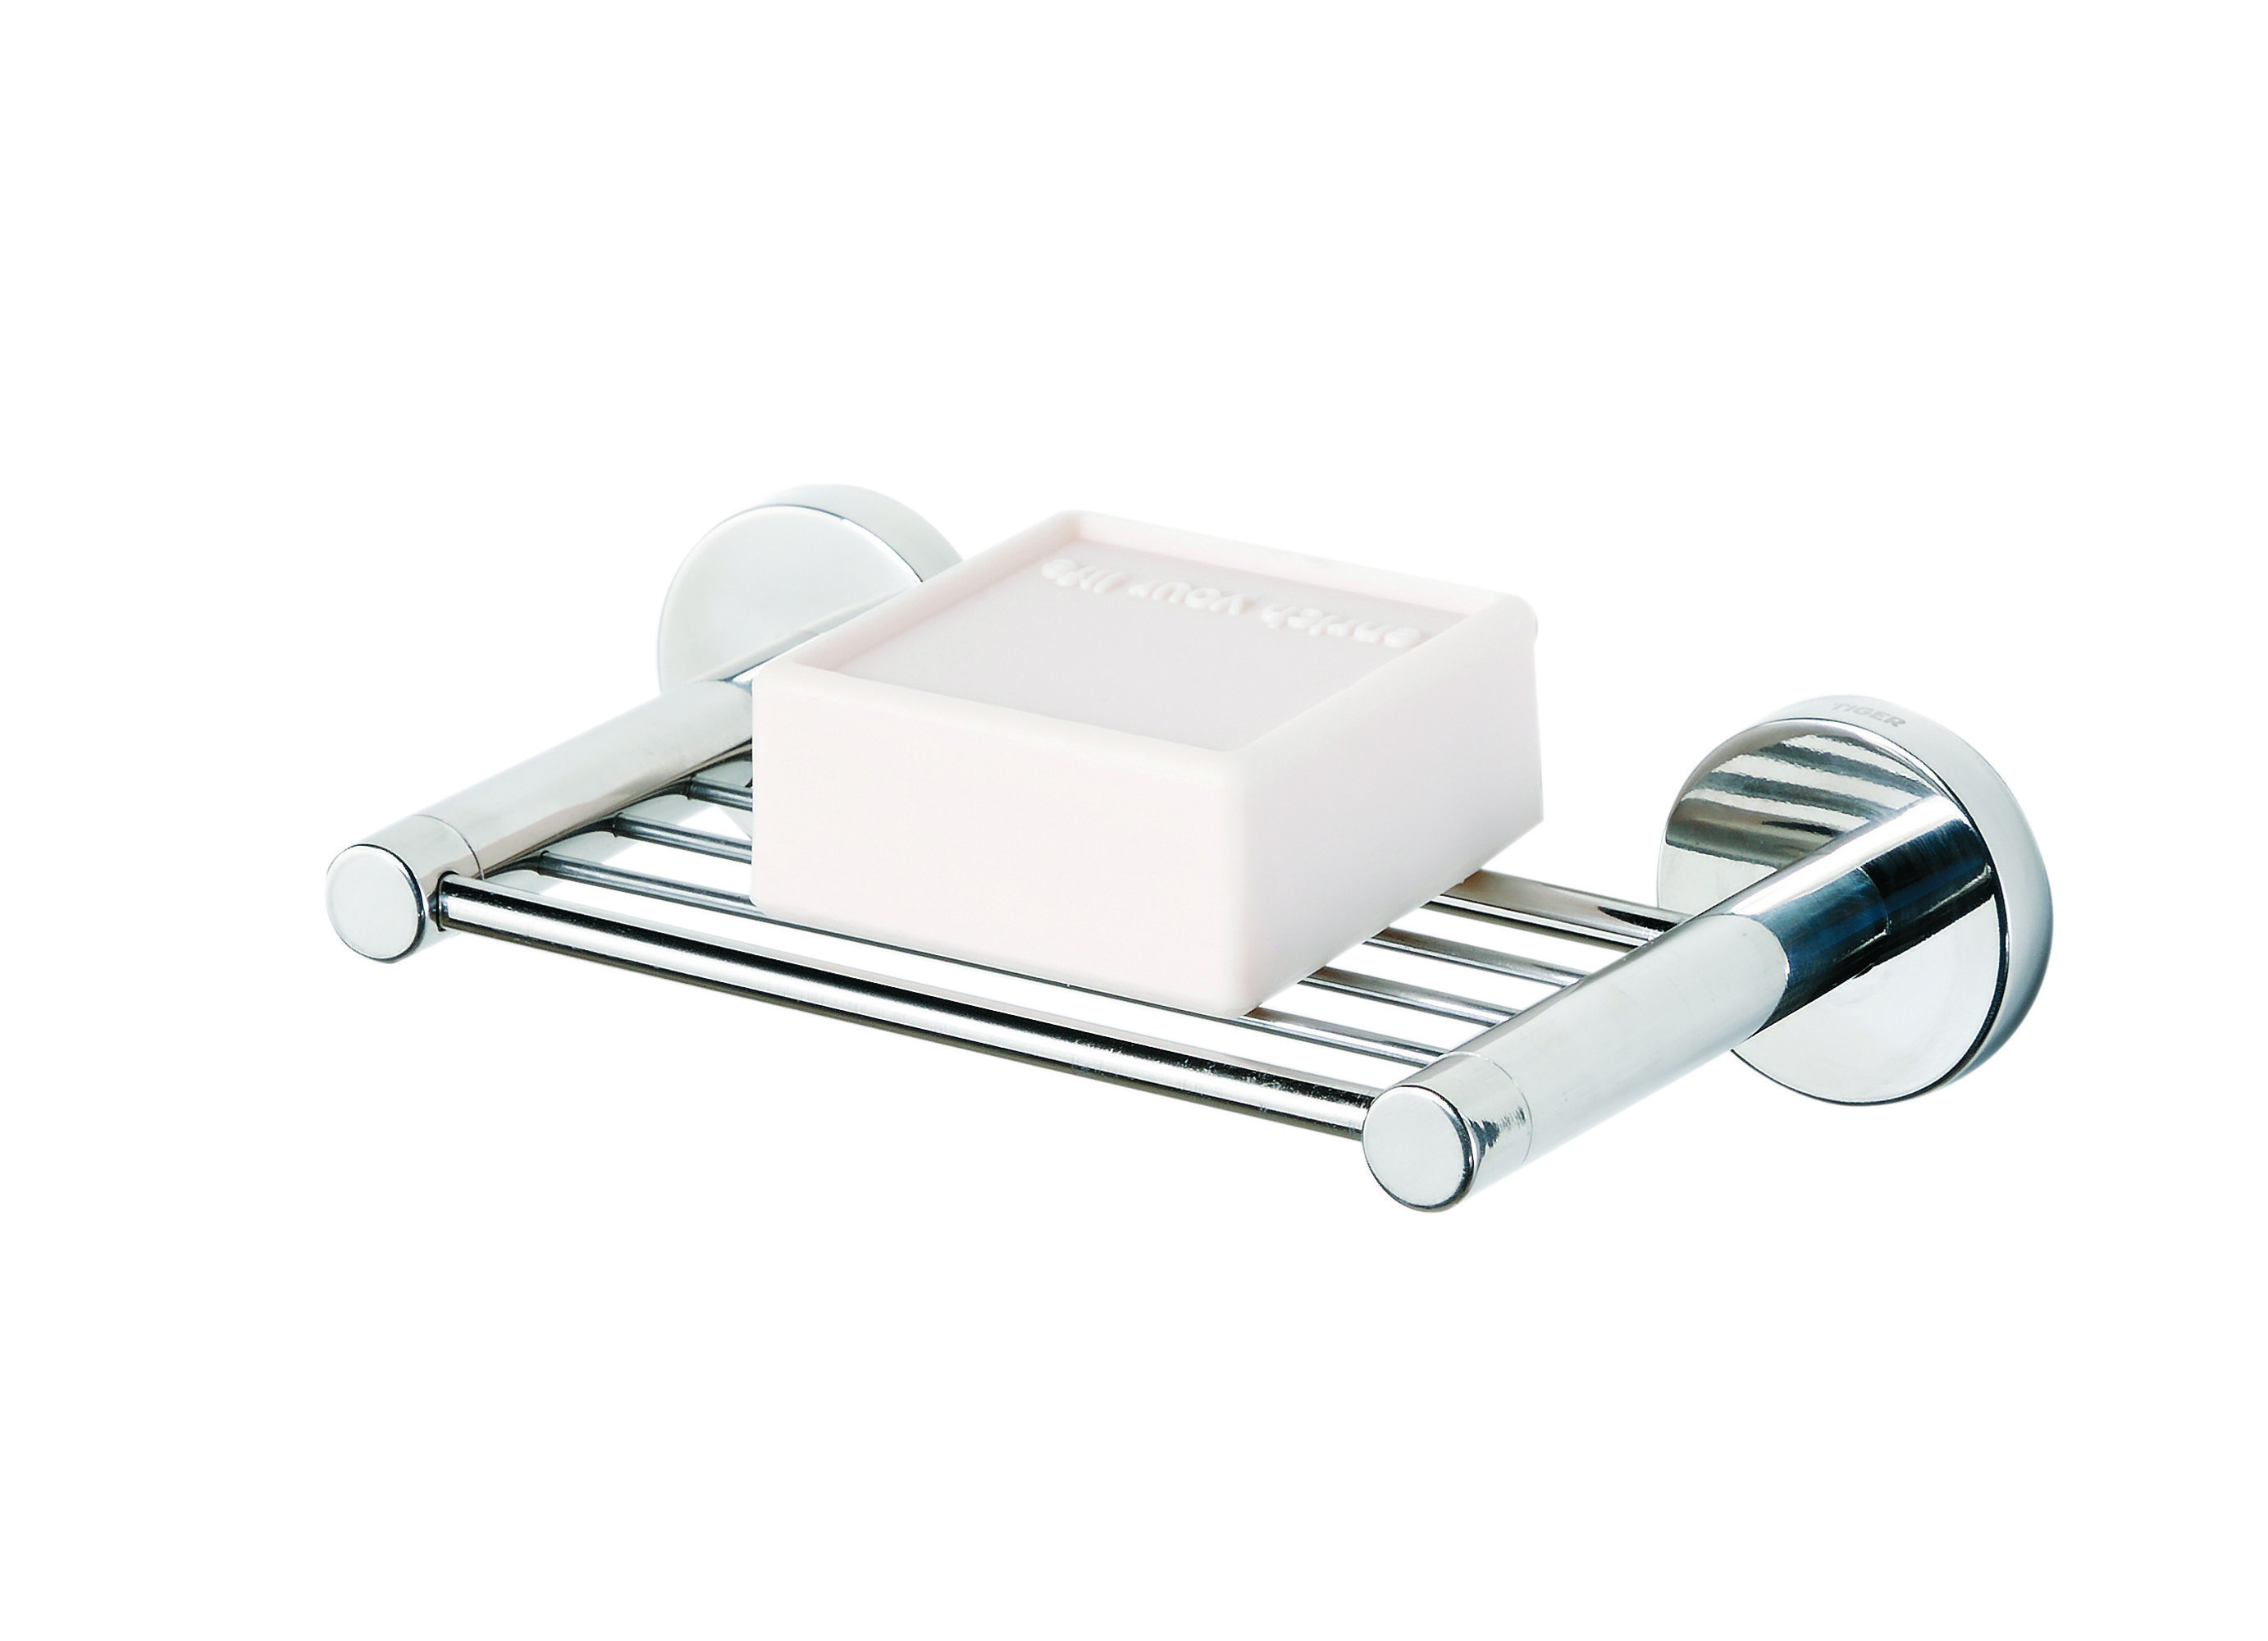 Tiger Badkamer Accessoires : Badkamer accessoires zeep accessoires